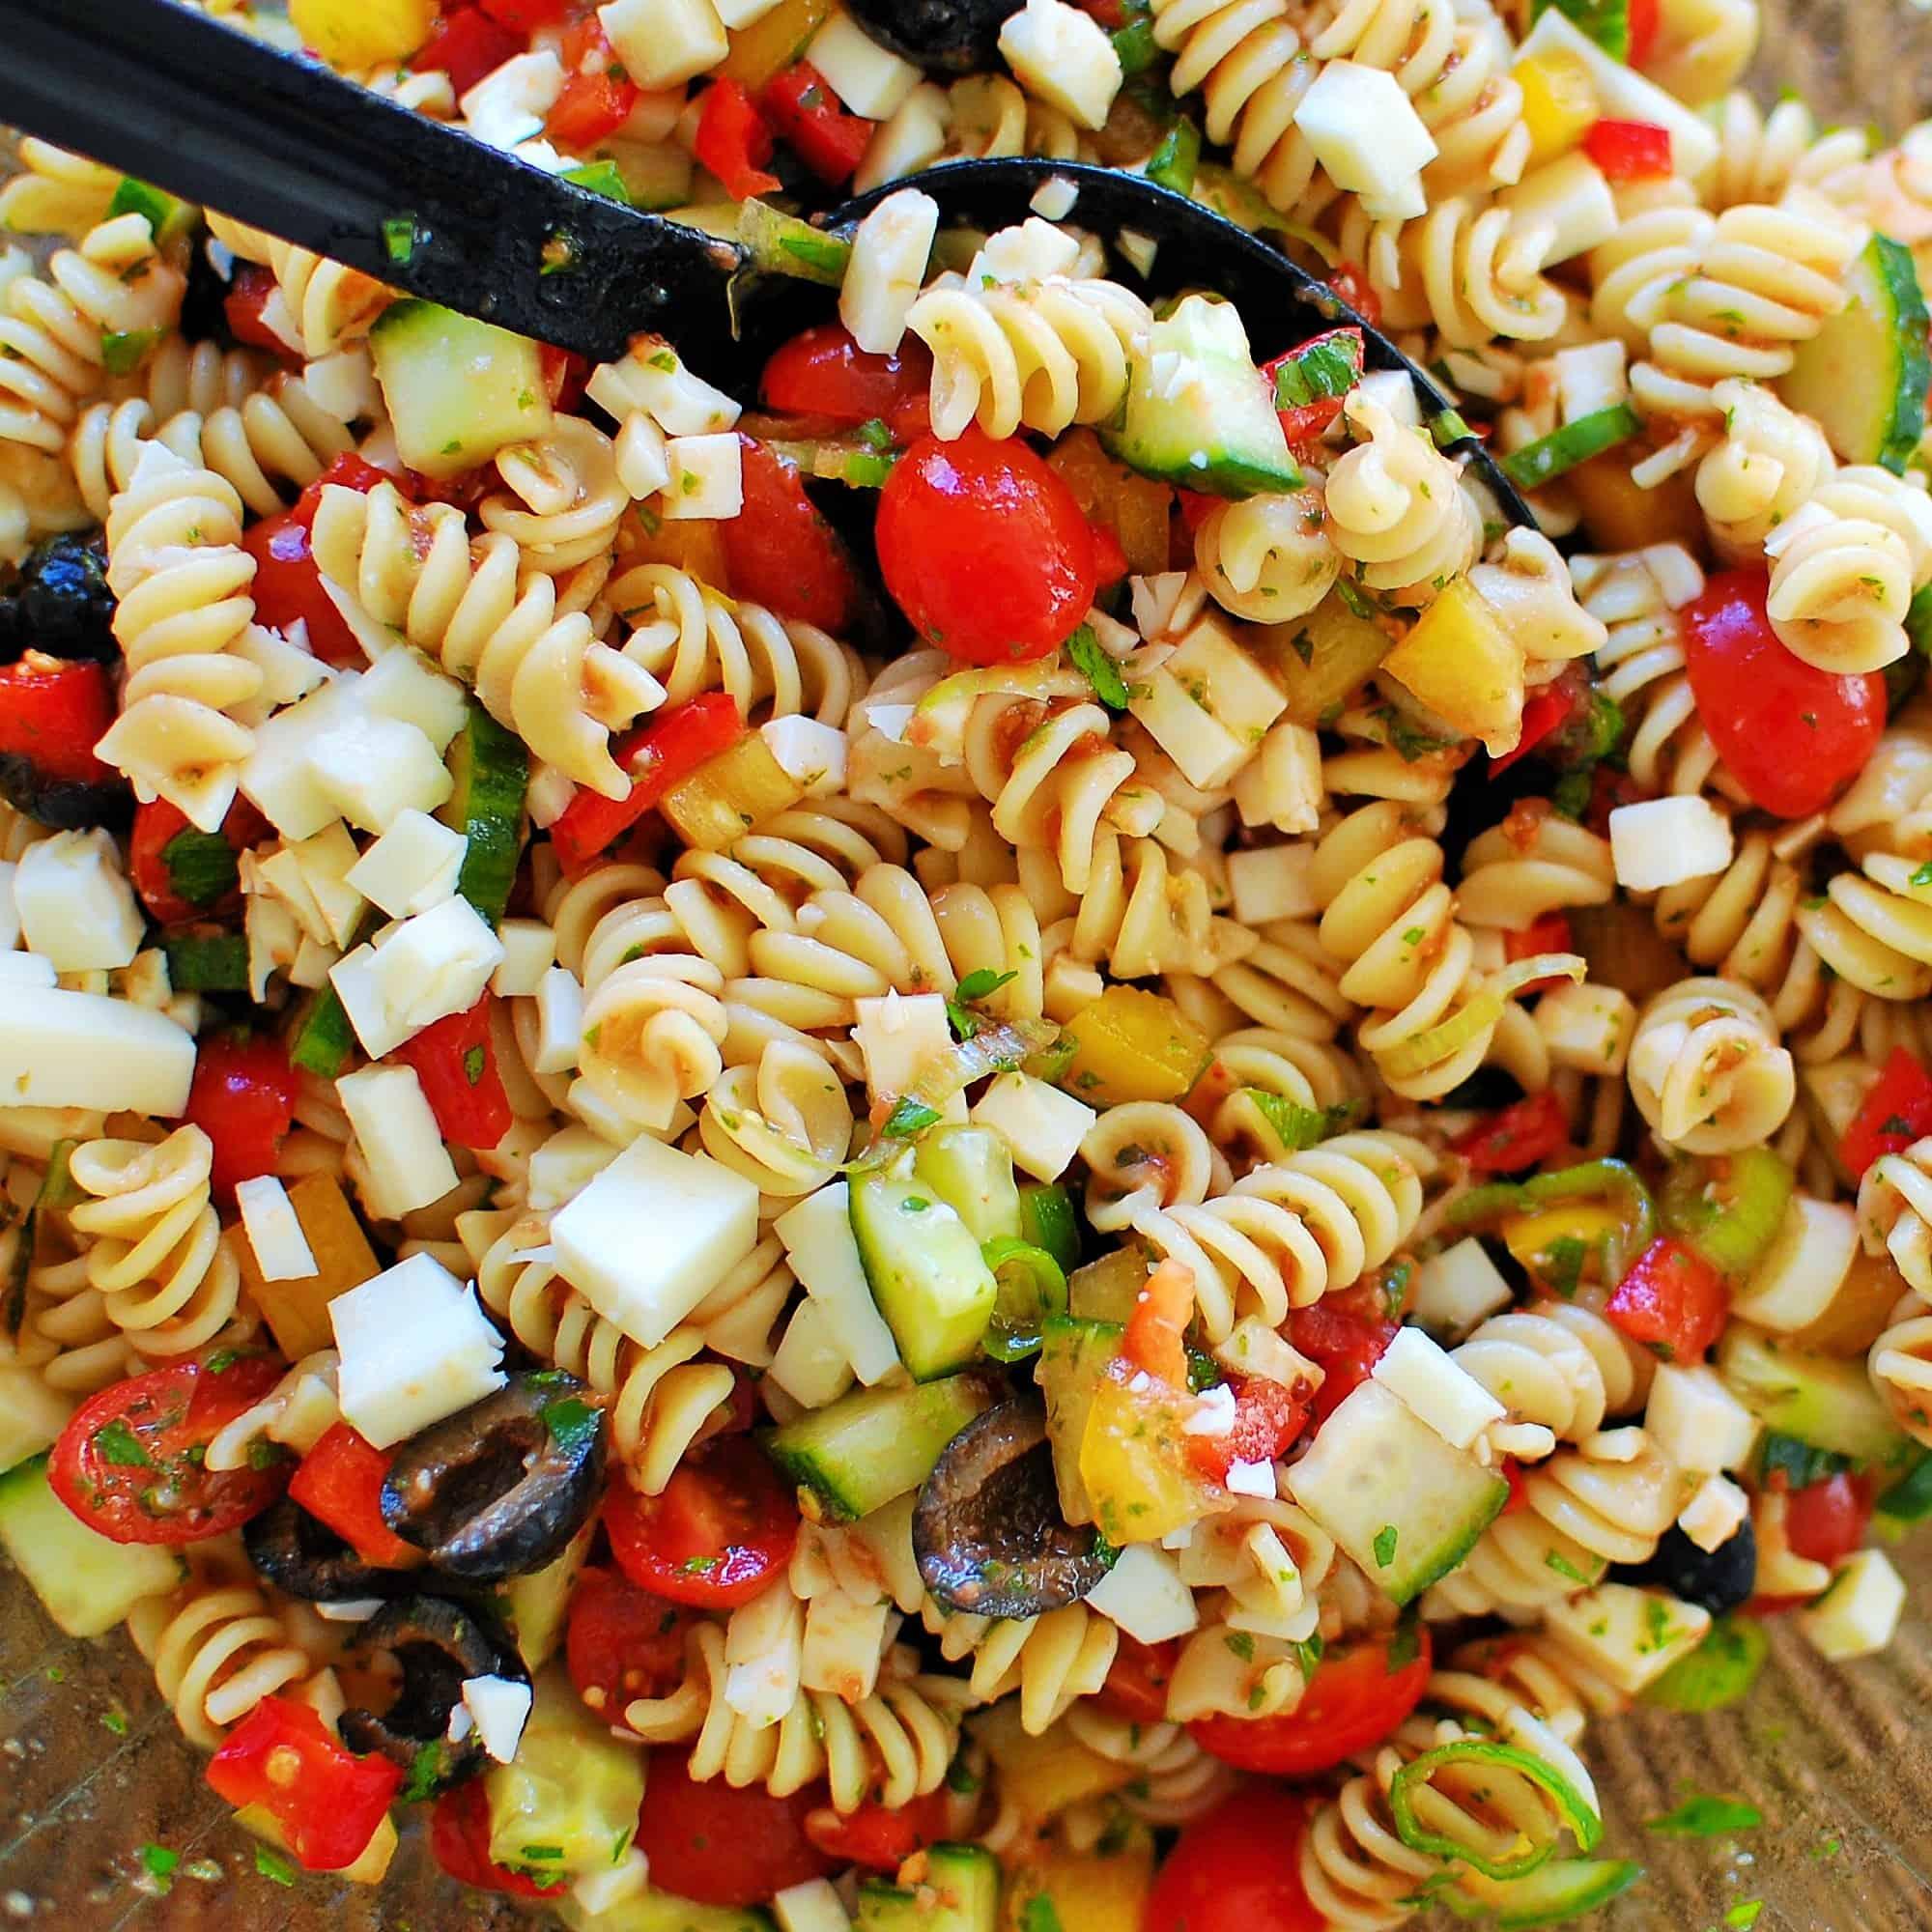 Cold pasta salad joe 39 s healthy meals for Cold pasta salad ideas